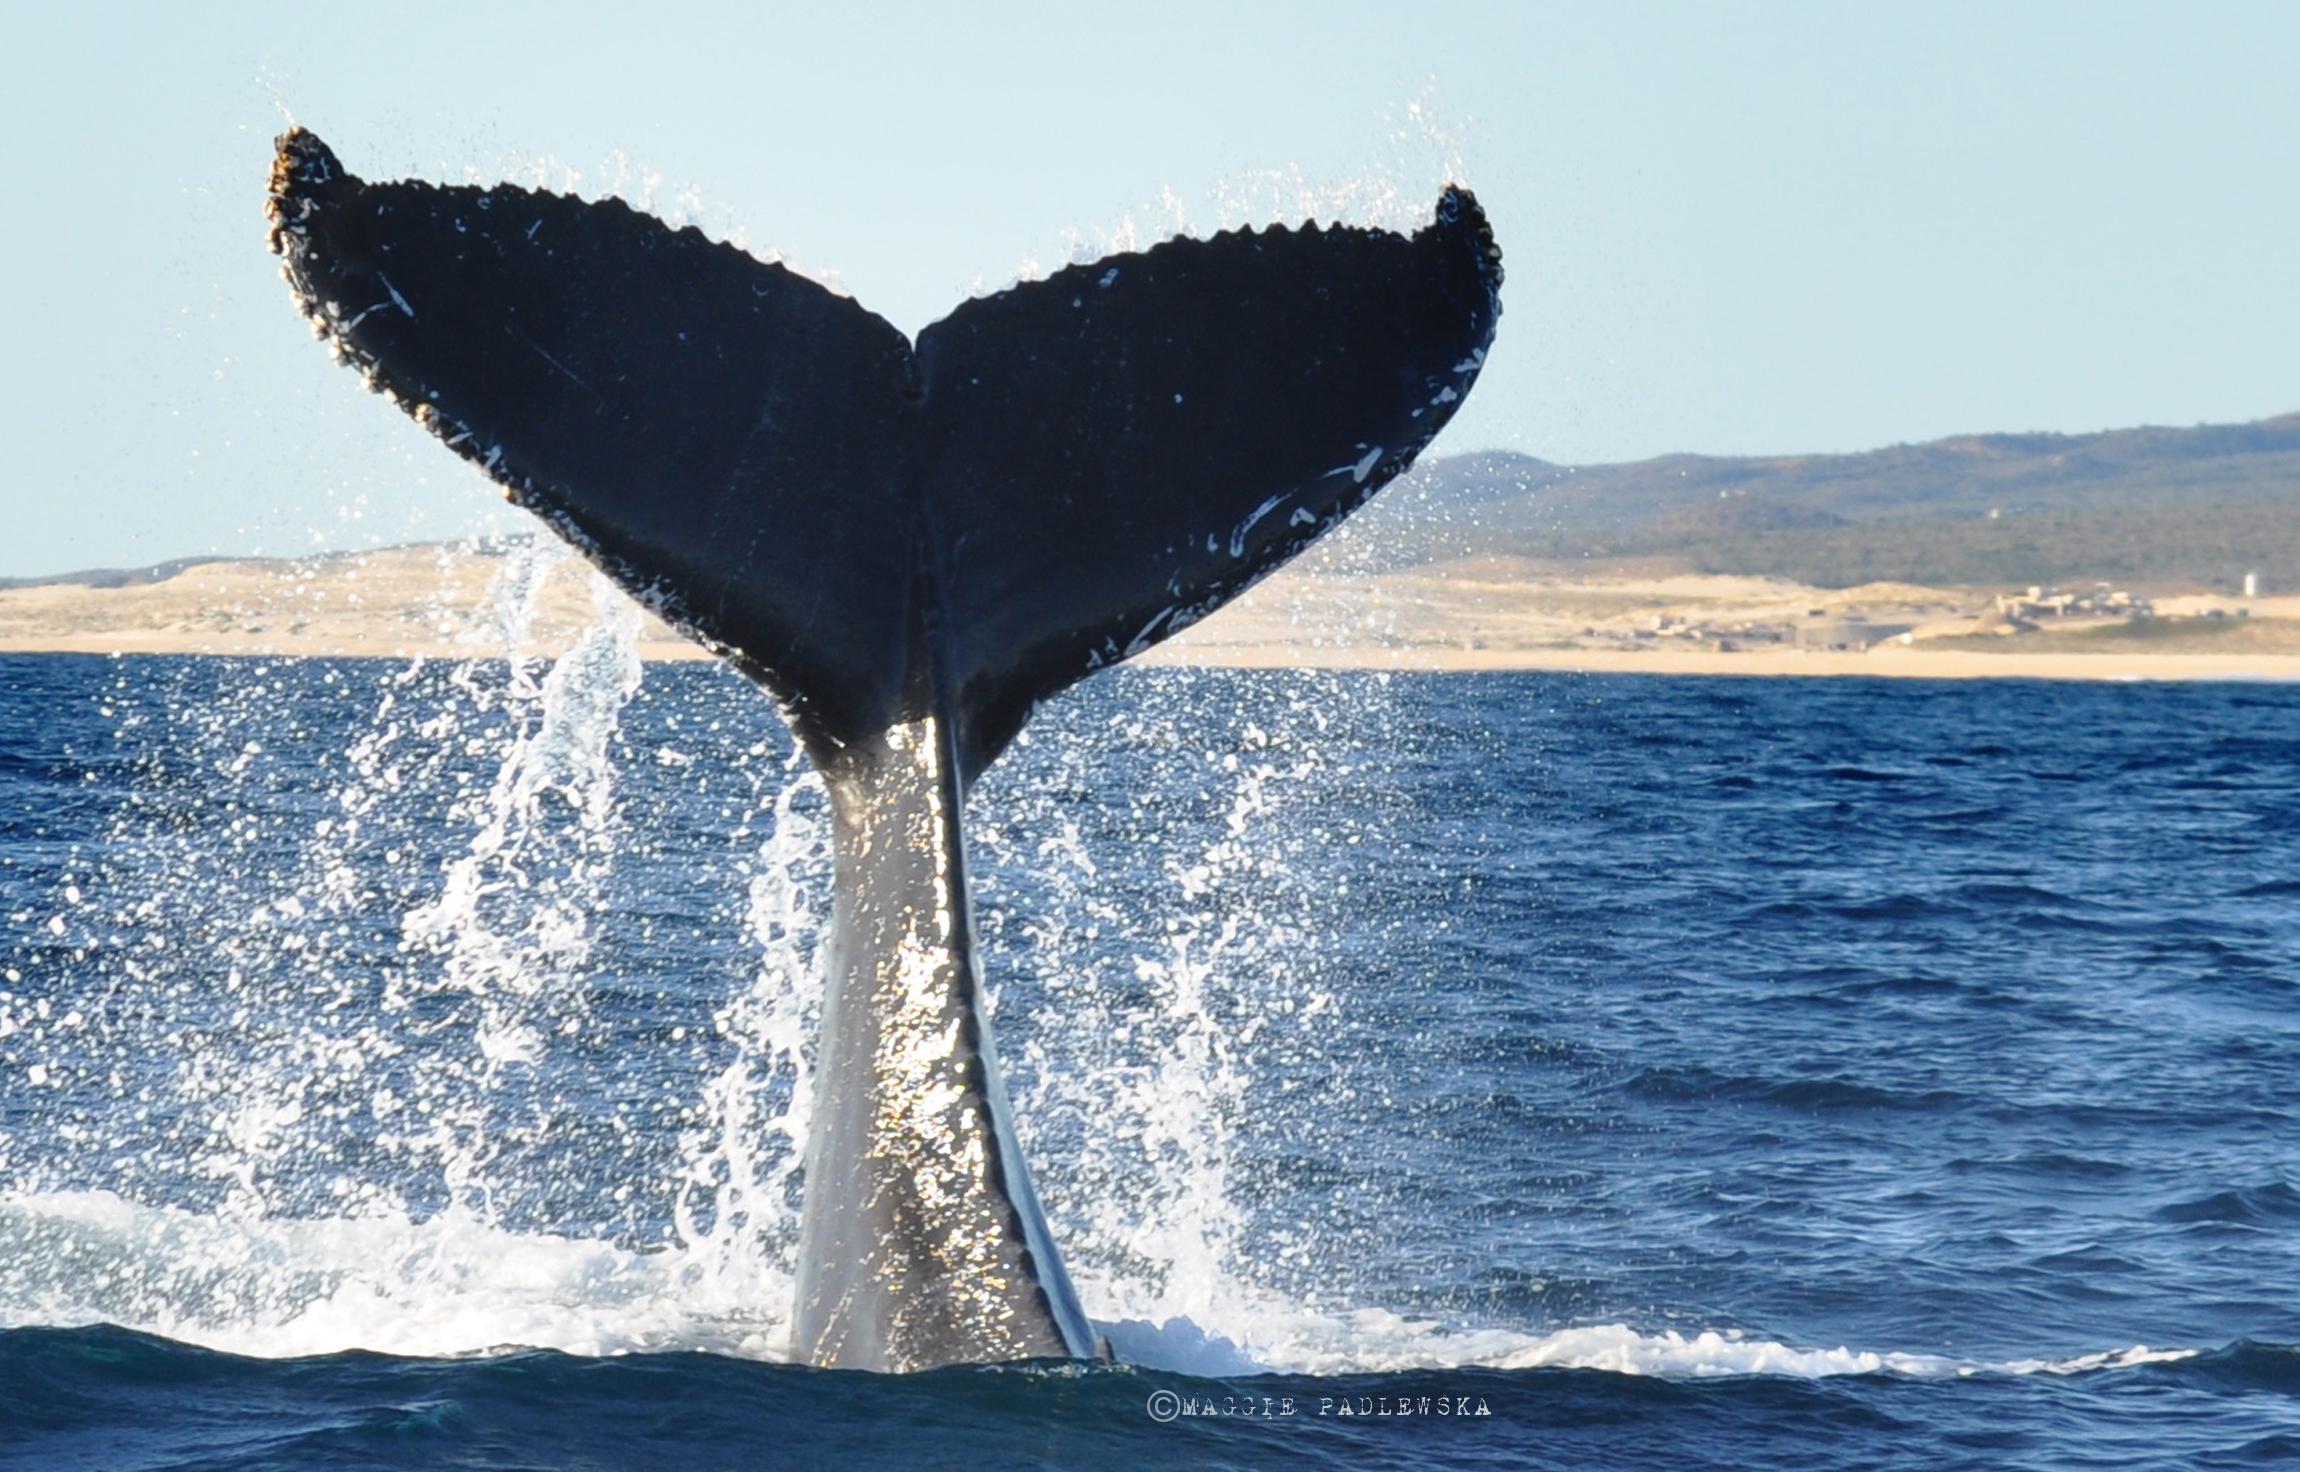 PADLEWSKA-Whale